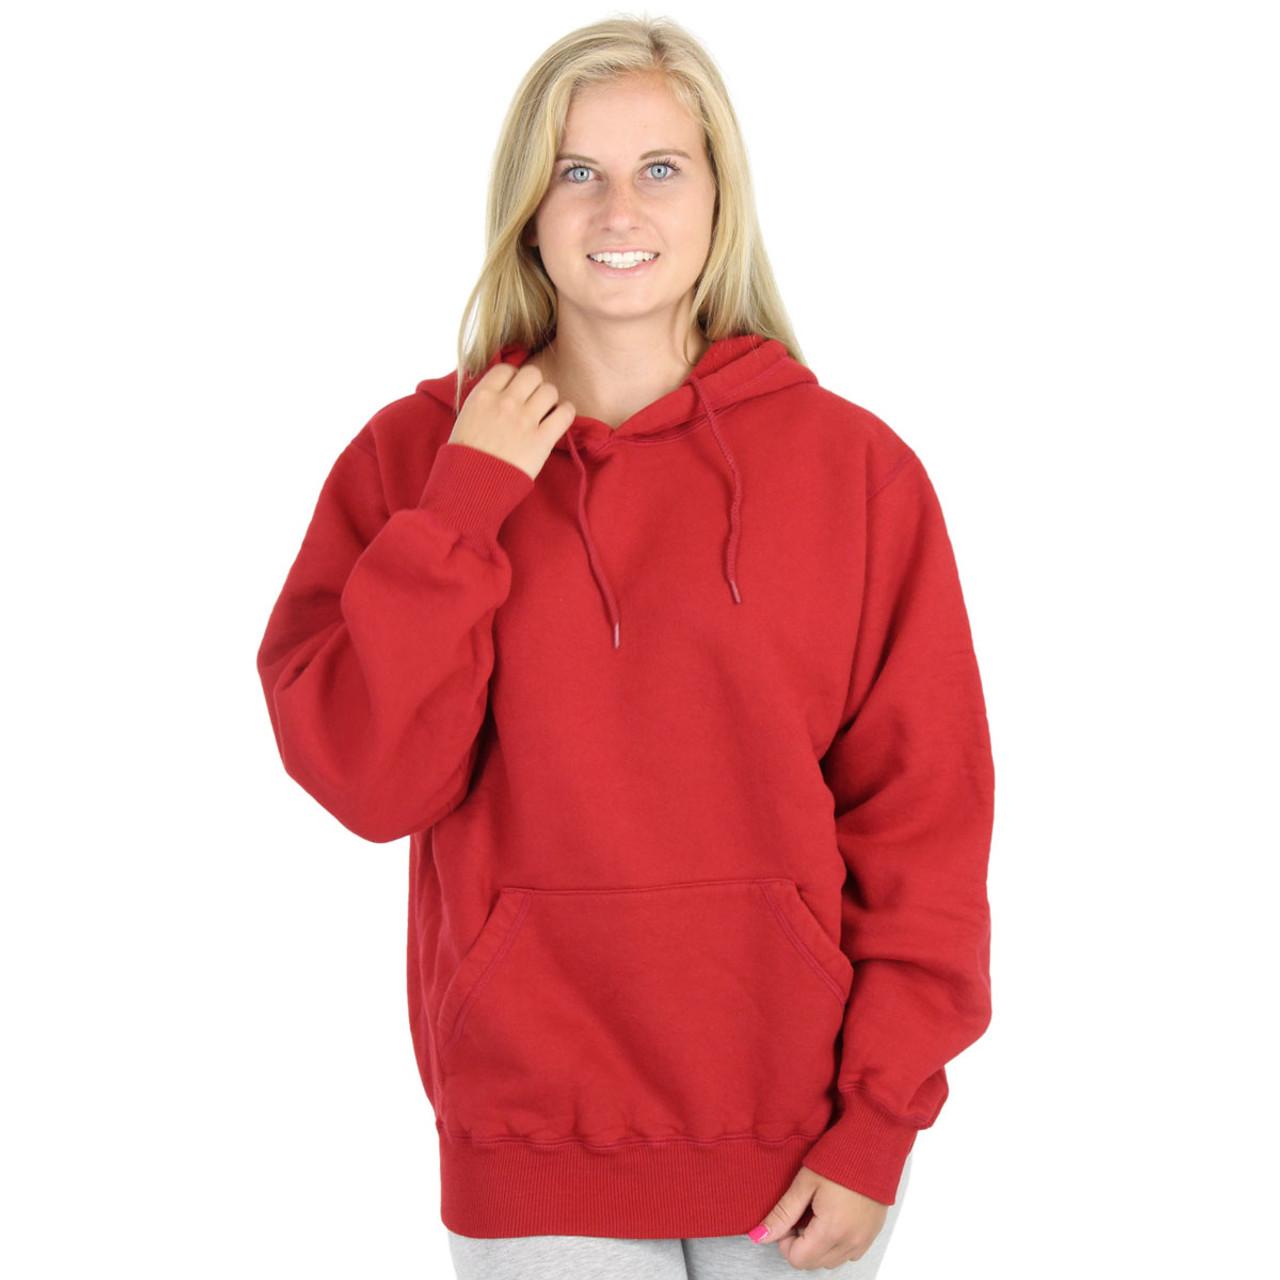 46ead5ef2 100% Heavy Cotton Womens Hoodie Pullover Sweatshirt